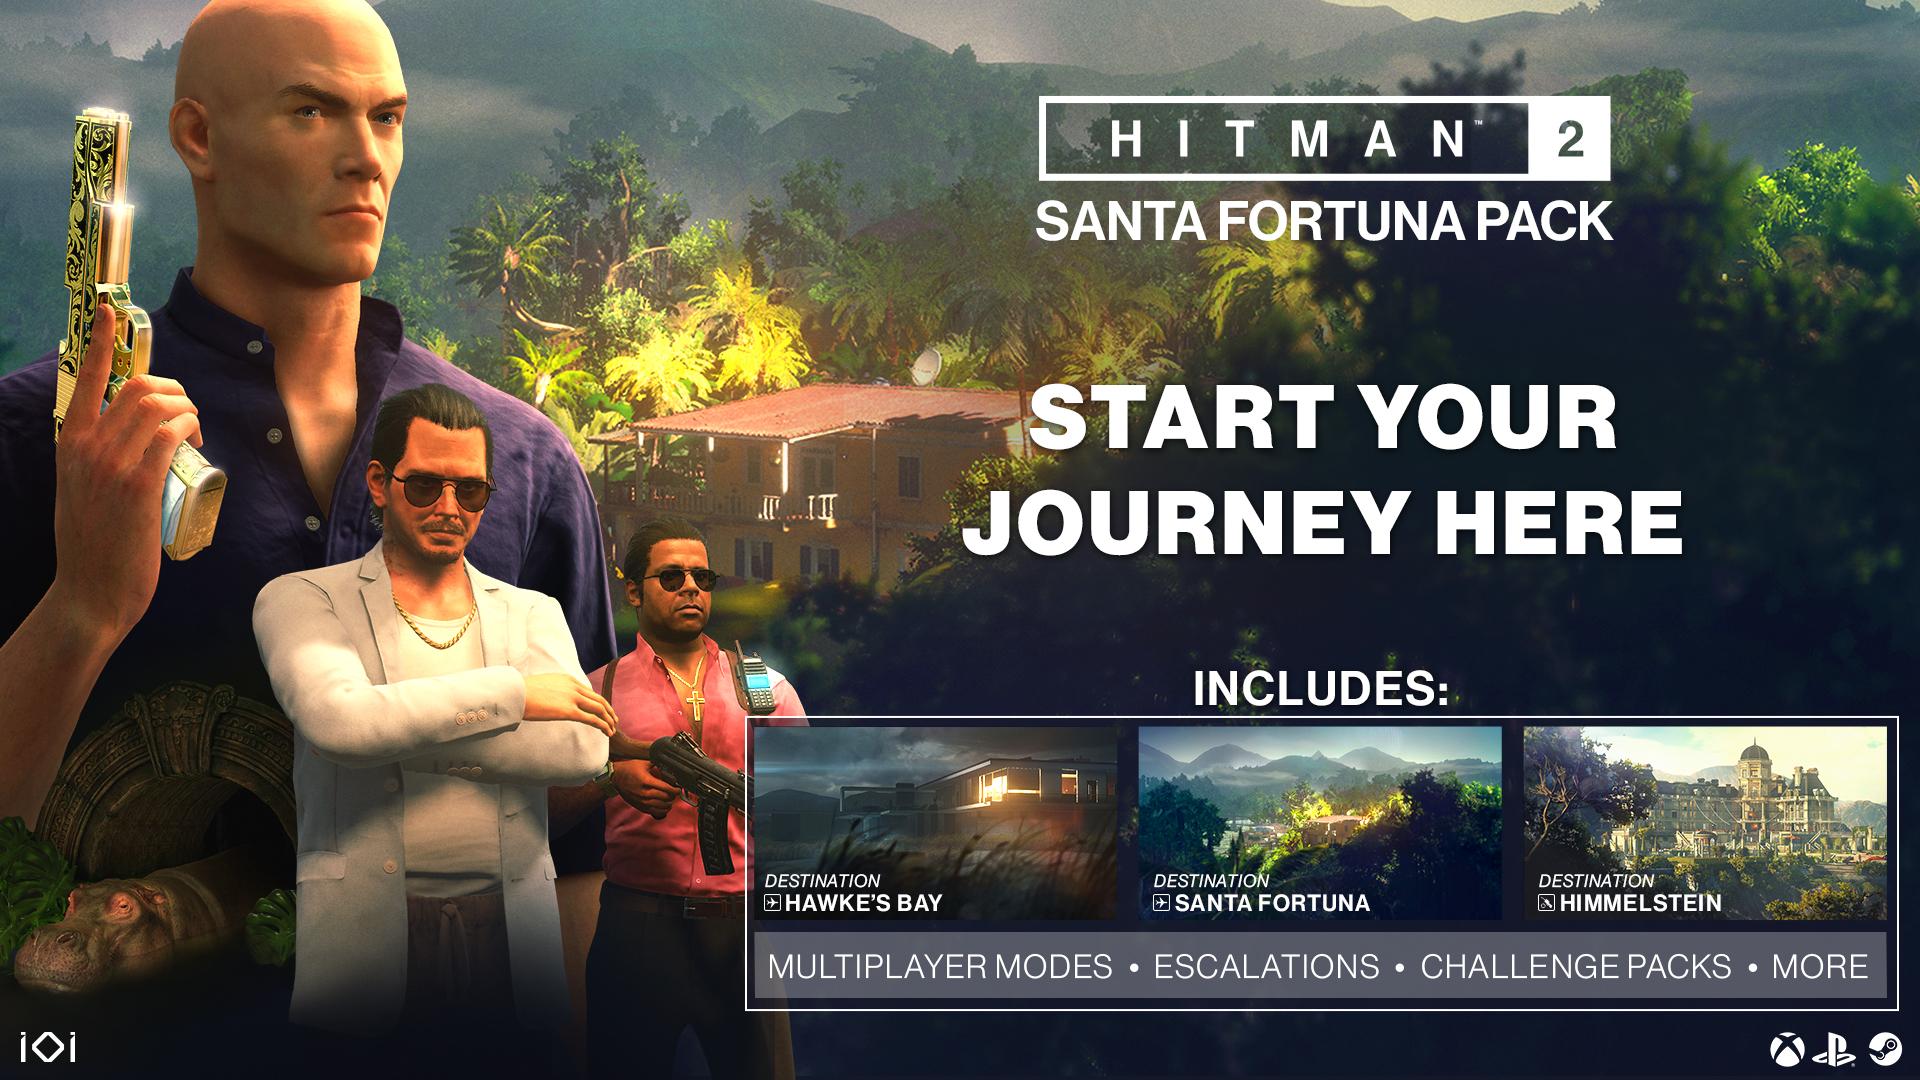 Hitman 2 Santa Fortuna Pack Gets You 2 Missions Sniper Assassin